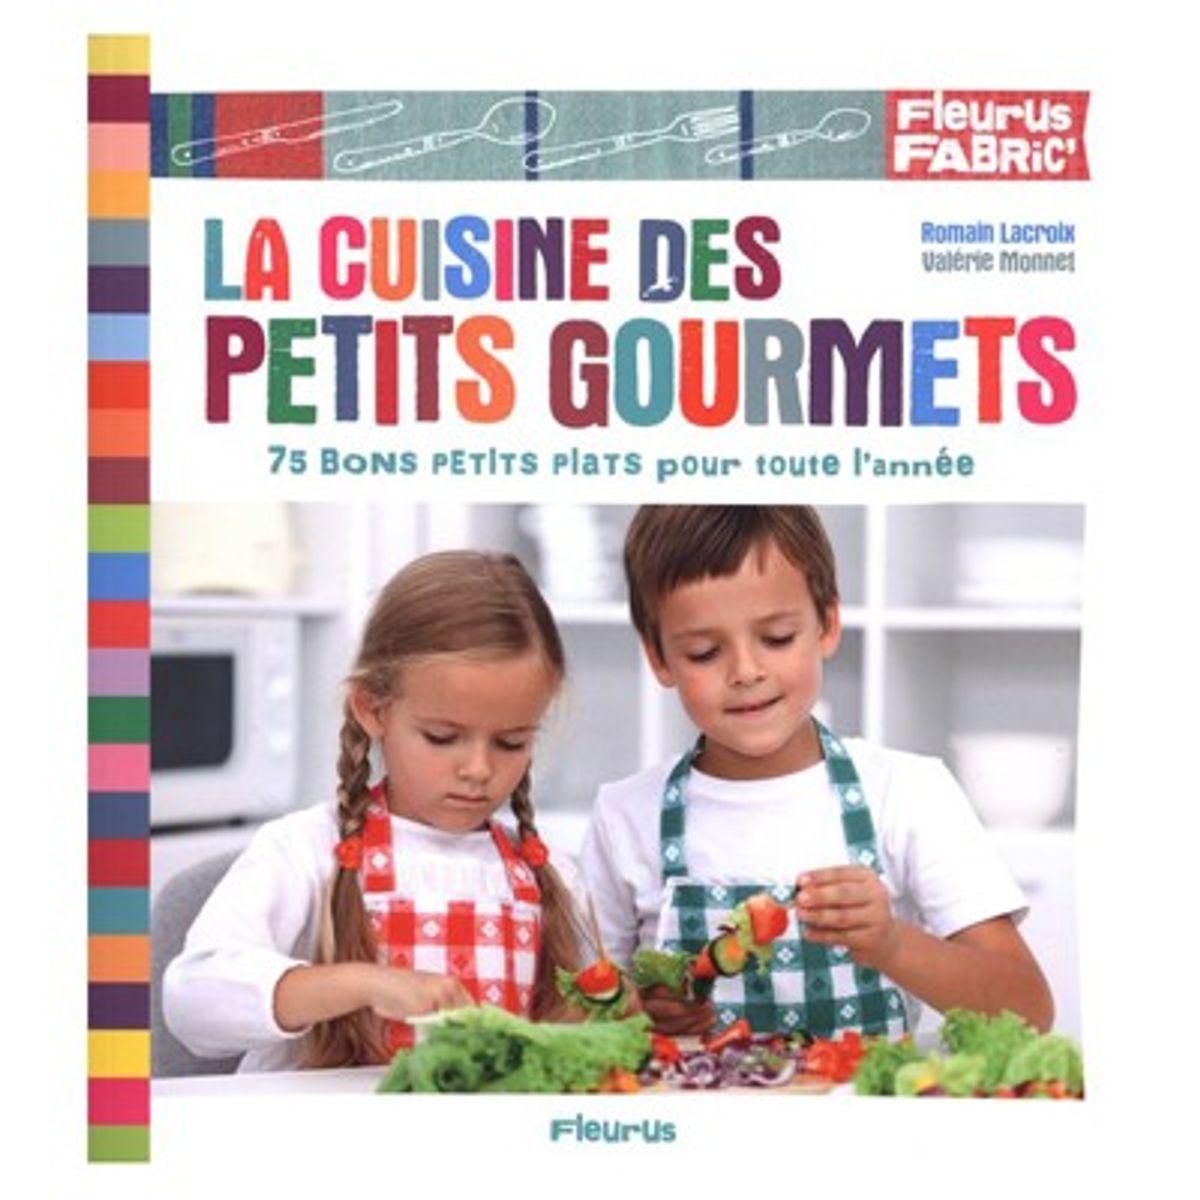 La cuisine des petits gourmets fleurus alice d lice - La cuisine des petits ...